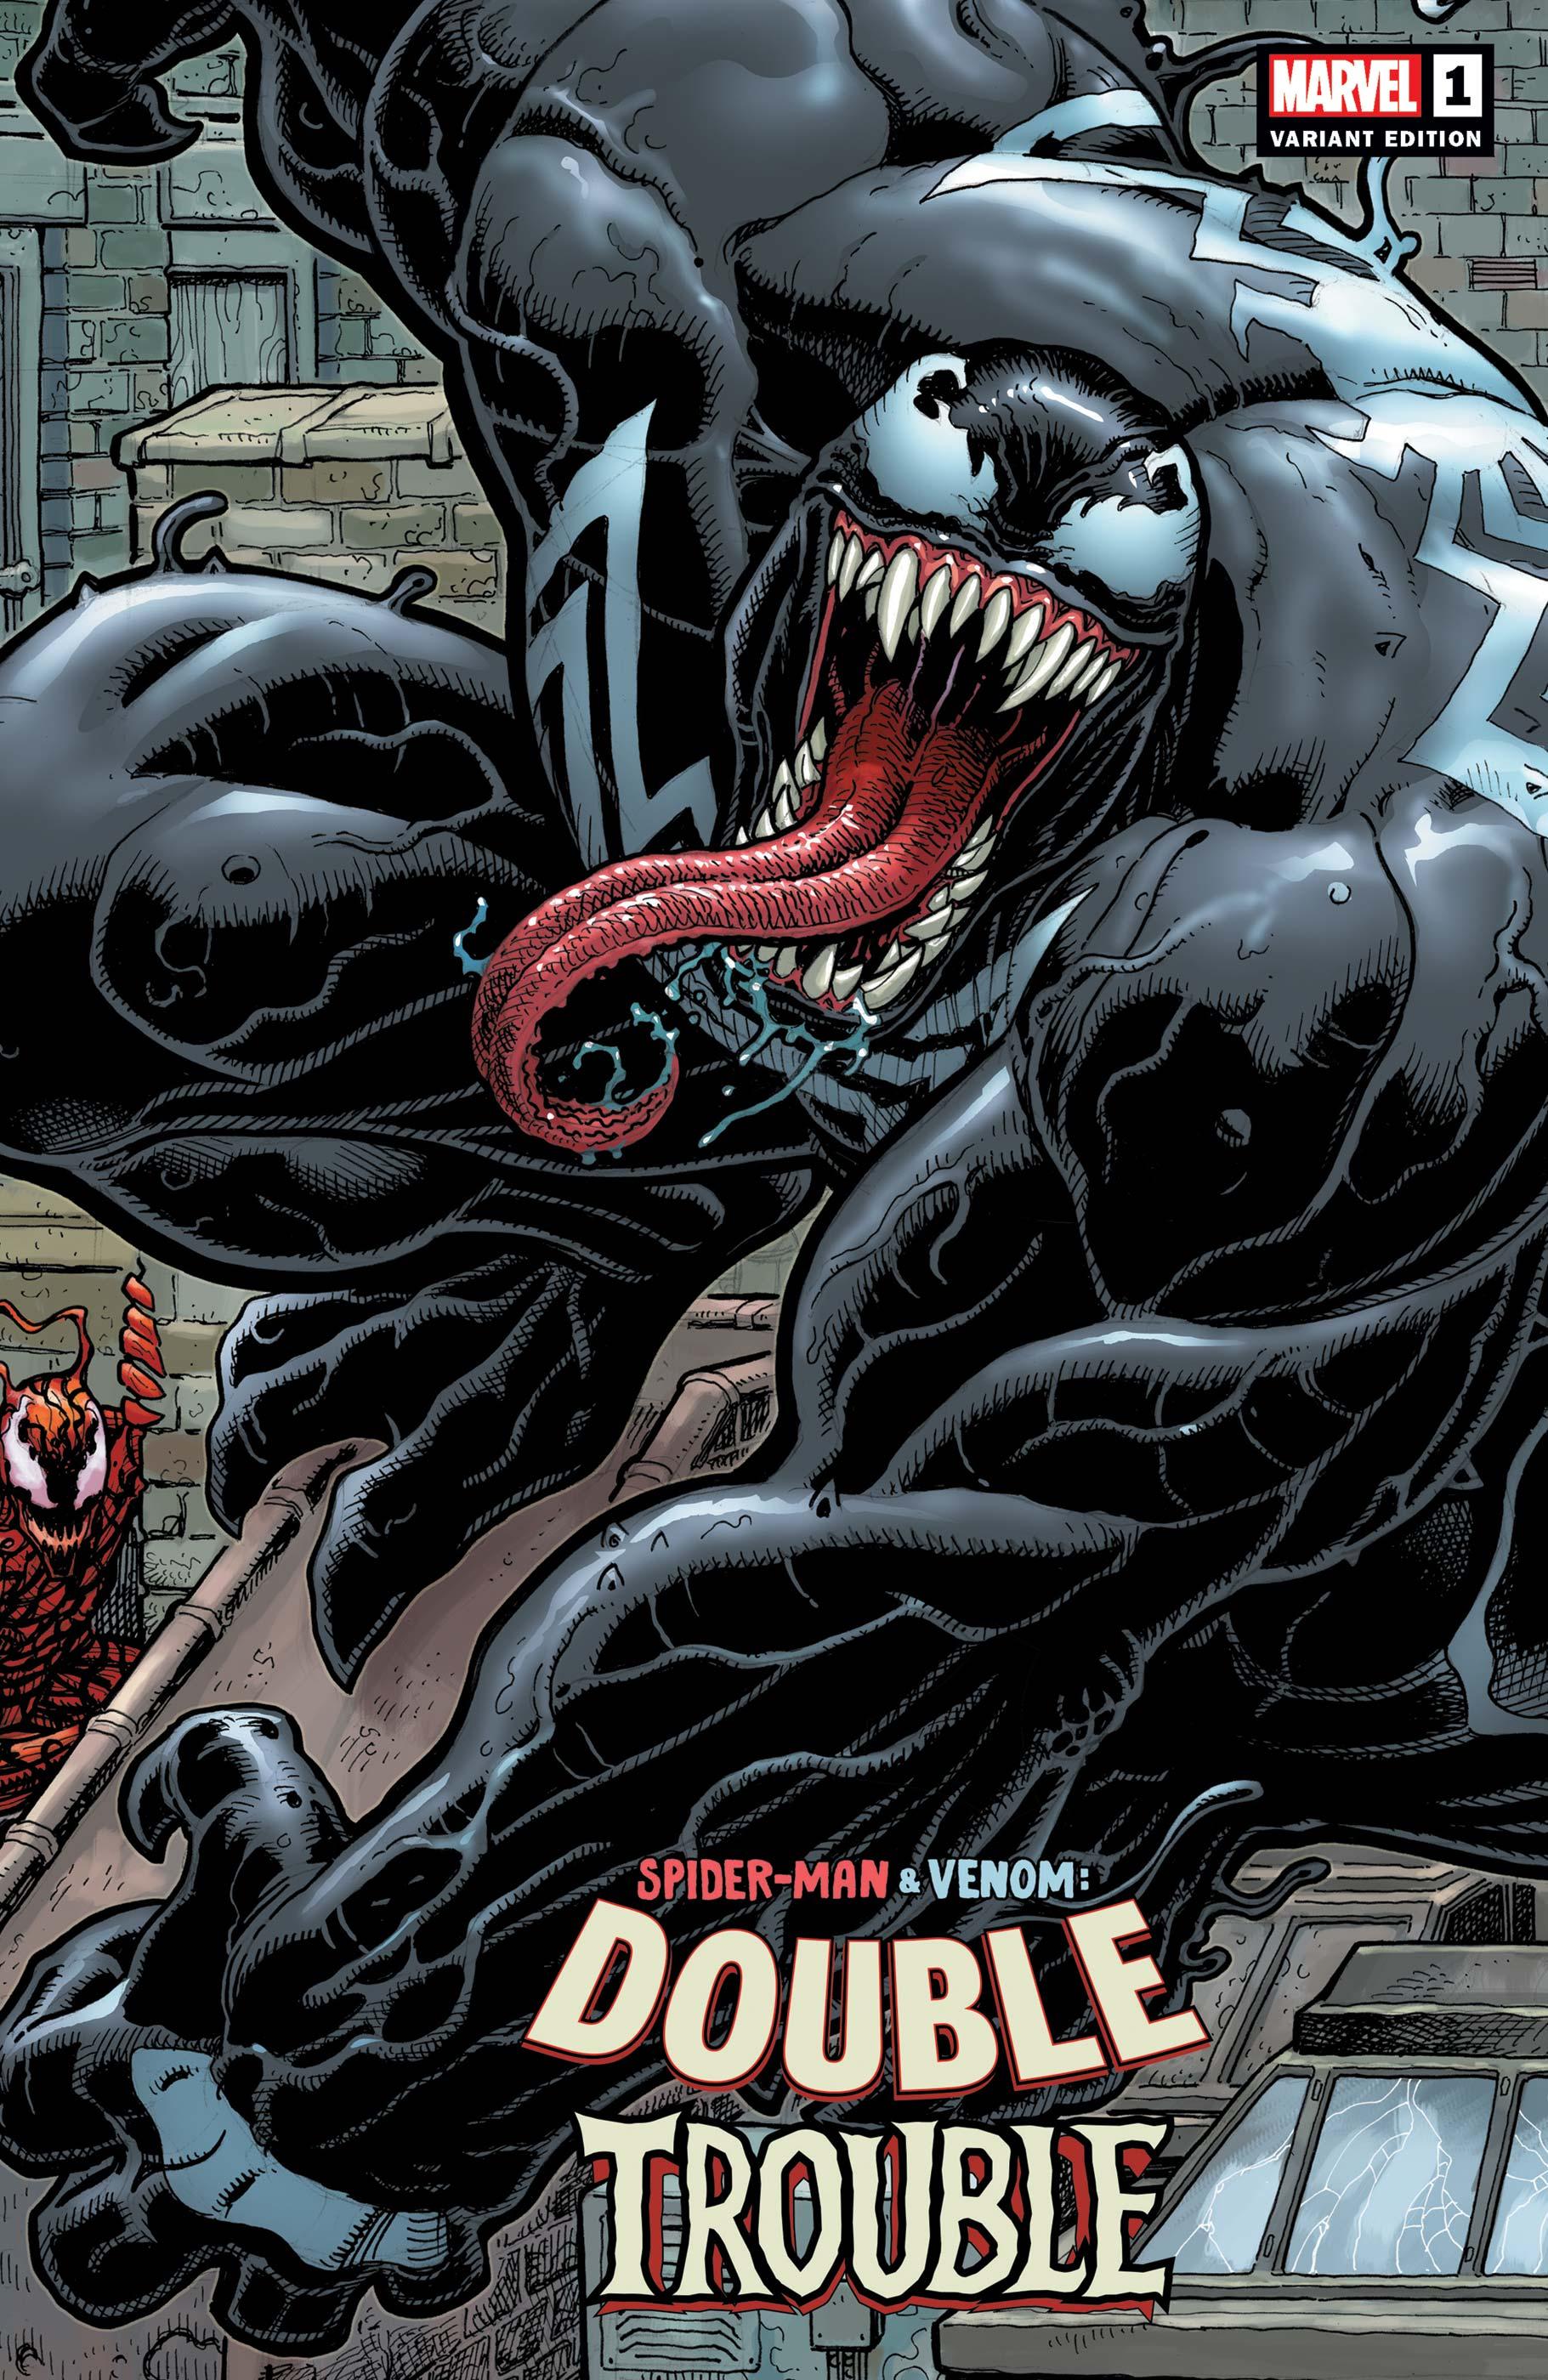 Spider-Man & Venom: Double Trouble (2019) #1 (Variant)